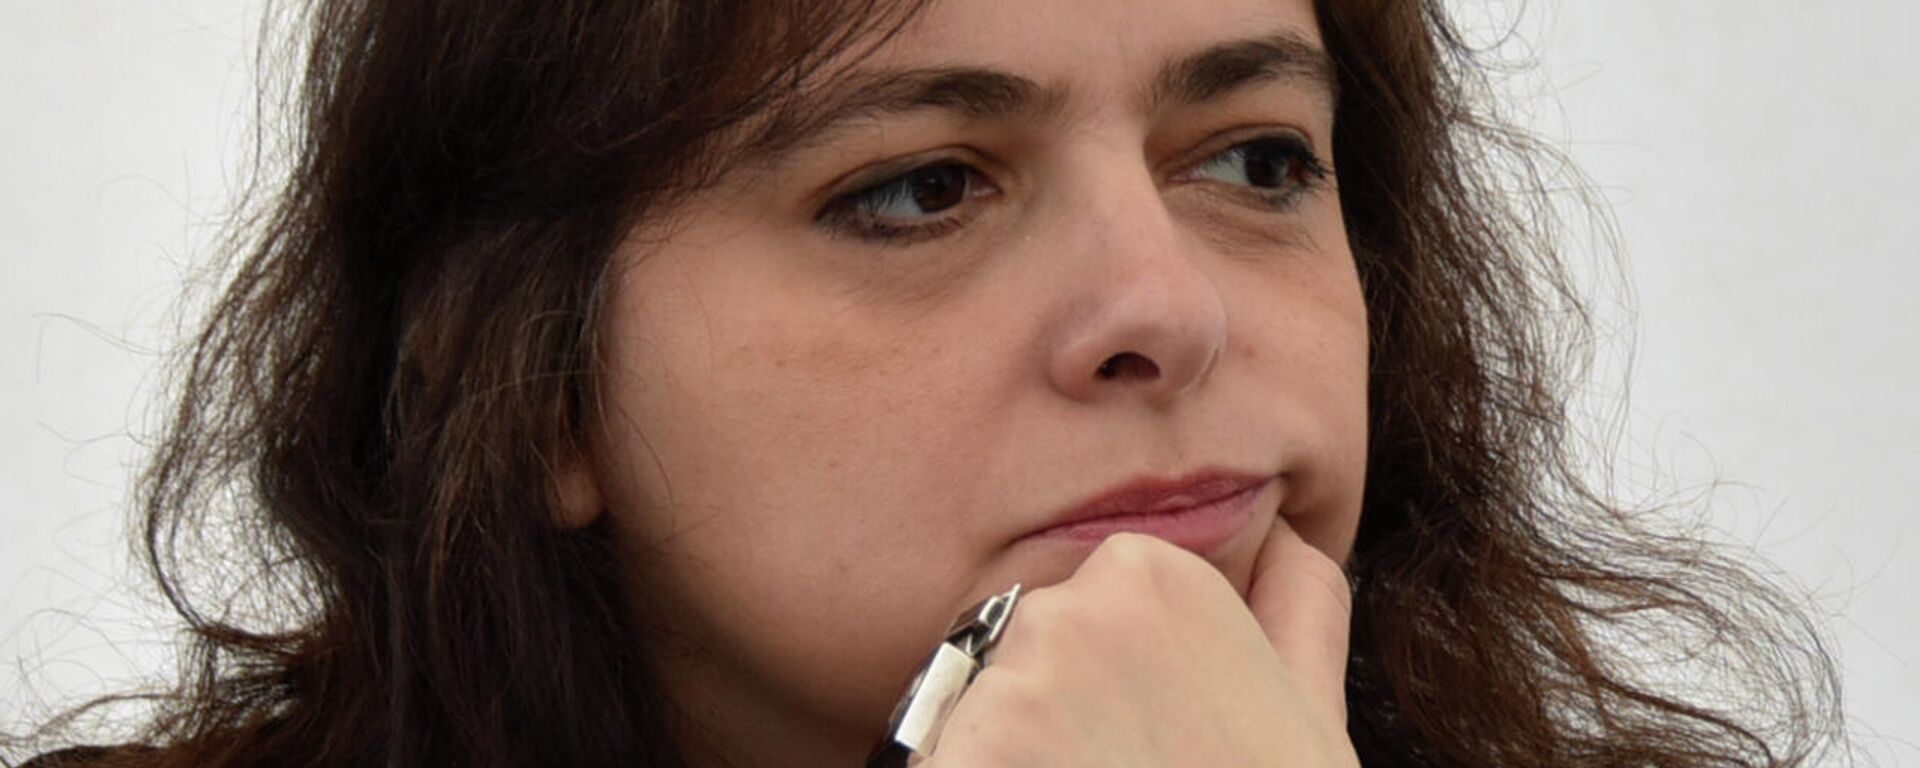 Mariana Enríquez, periodista, escritora y docente argentina - Sputnik Mundo, 1920, 30.03.2021